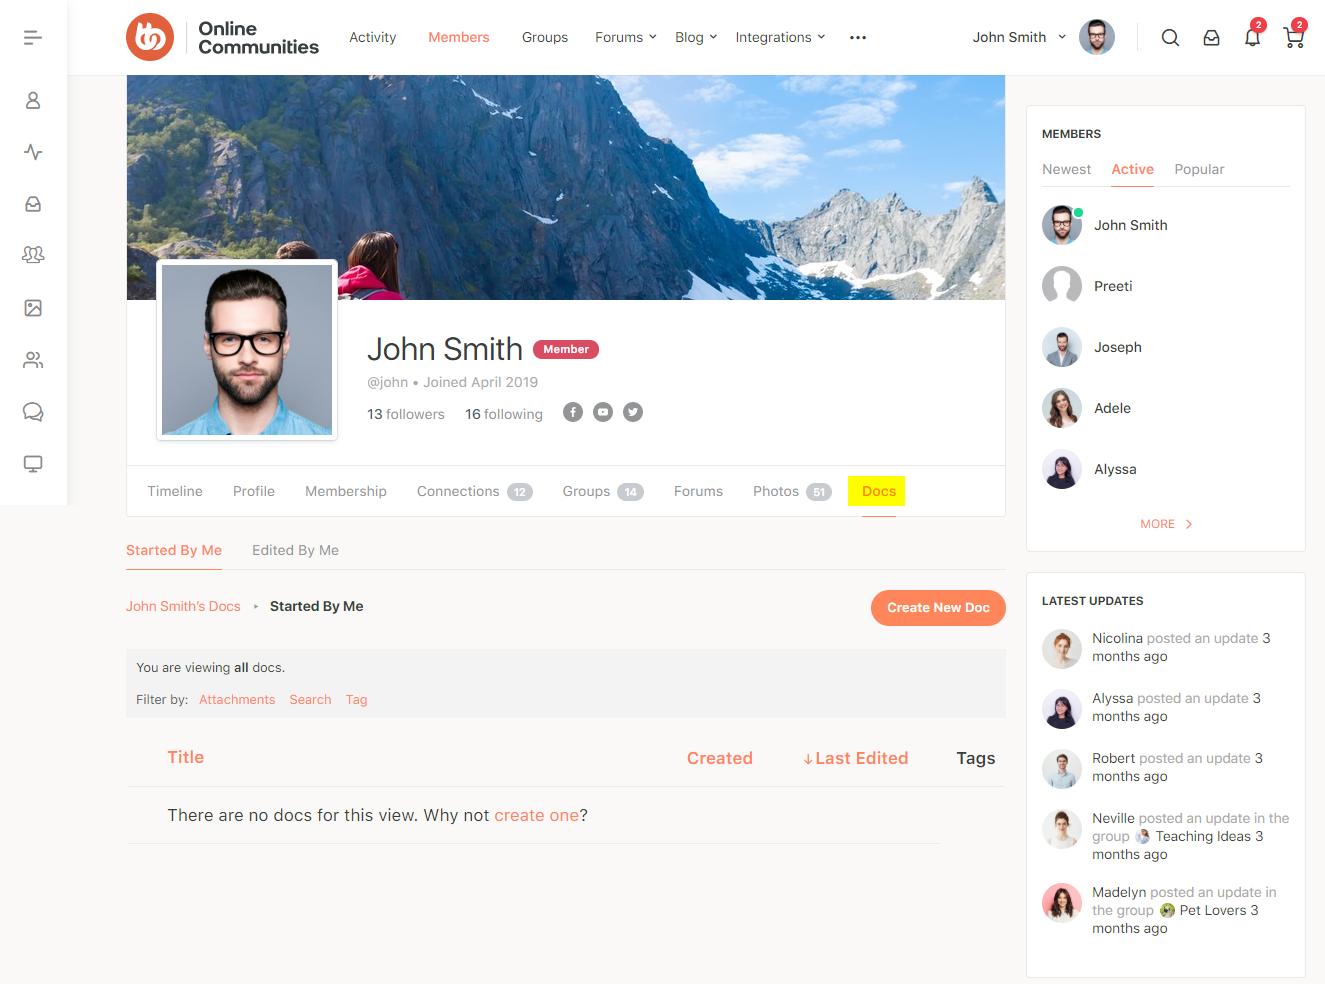 BuddyPress Docs - Docs tab on a user's profile